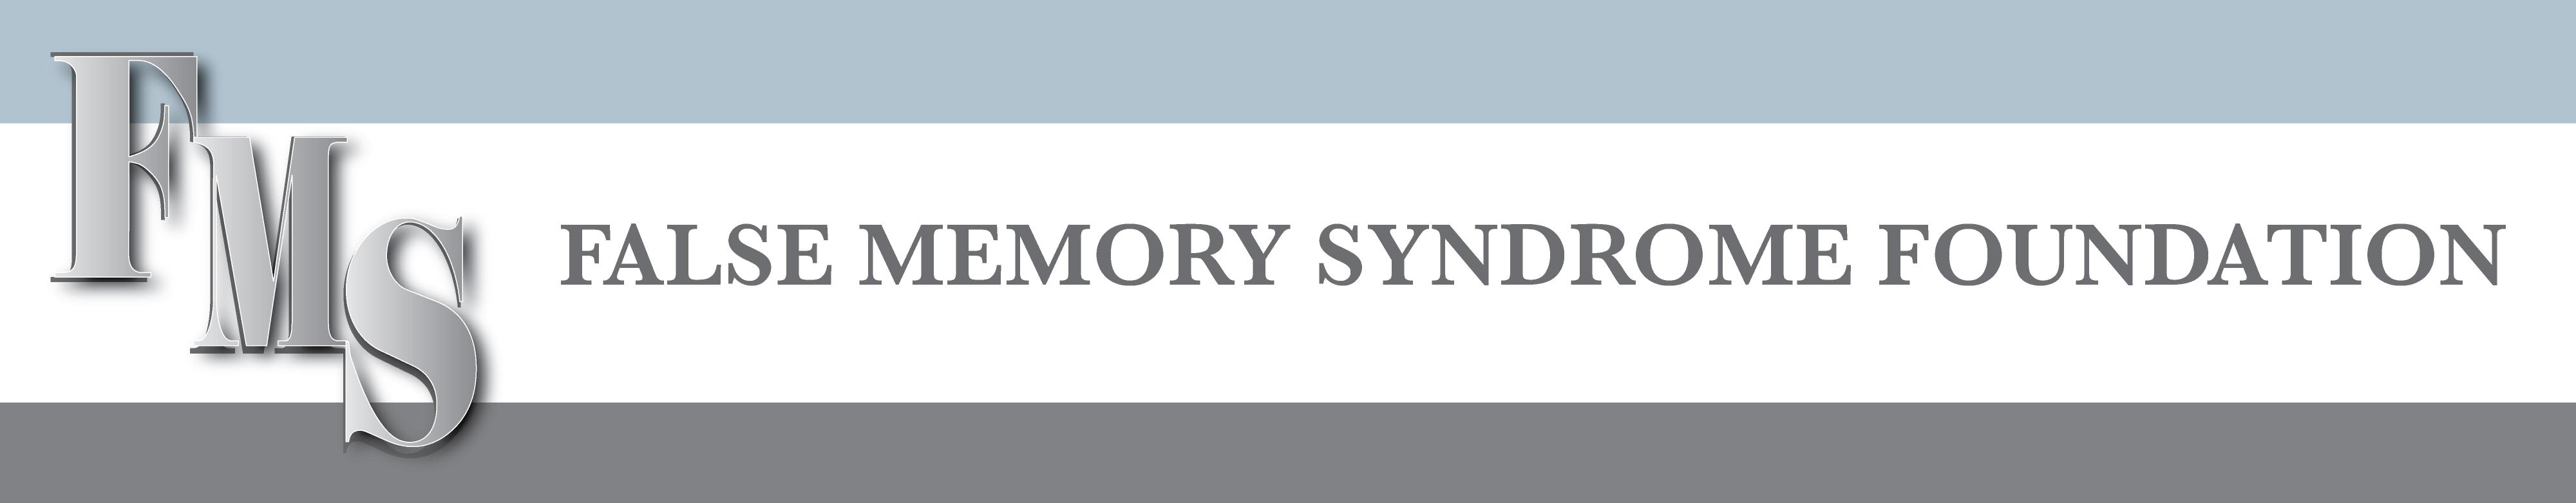 false memory examples